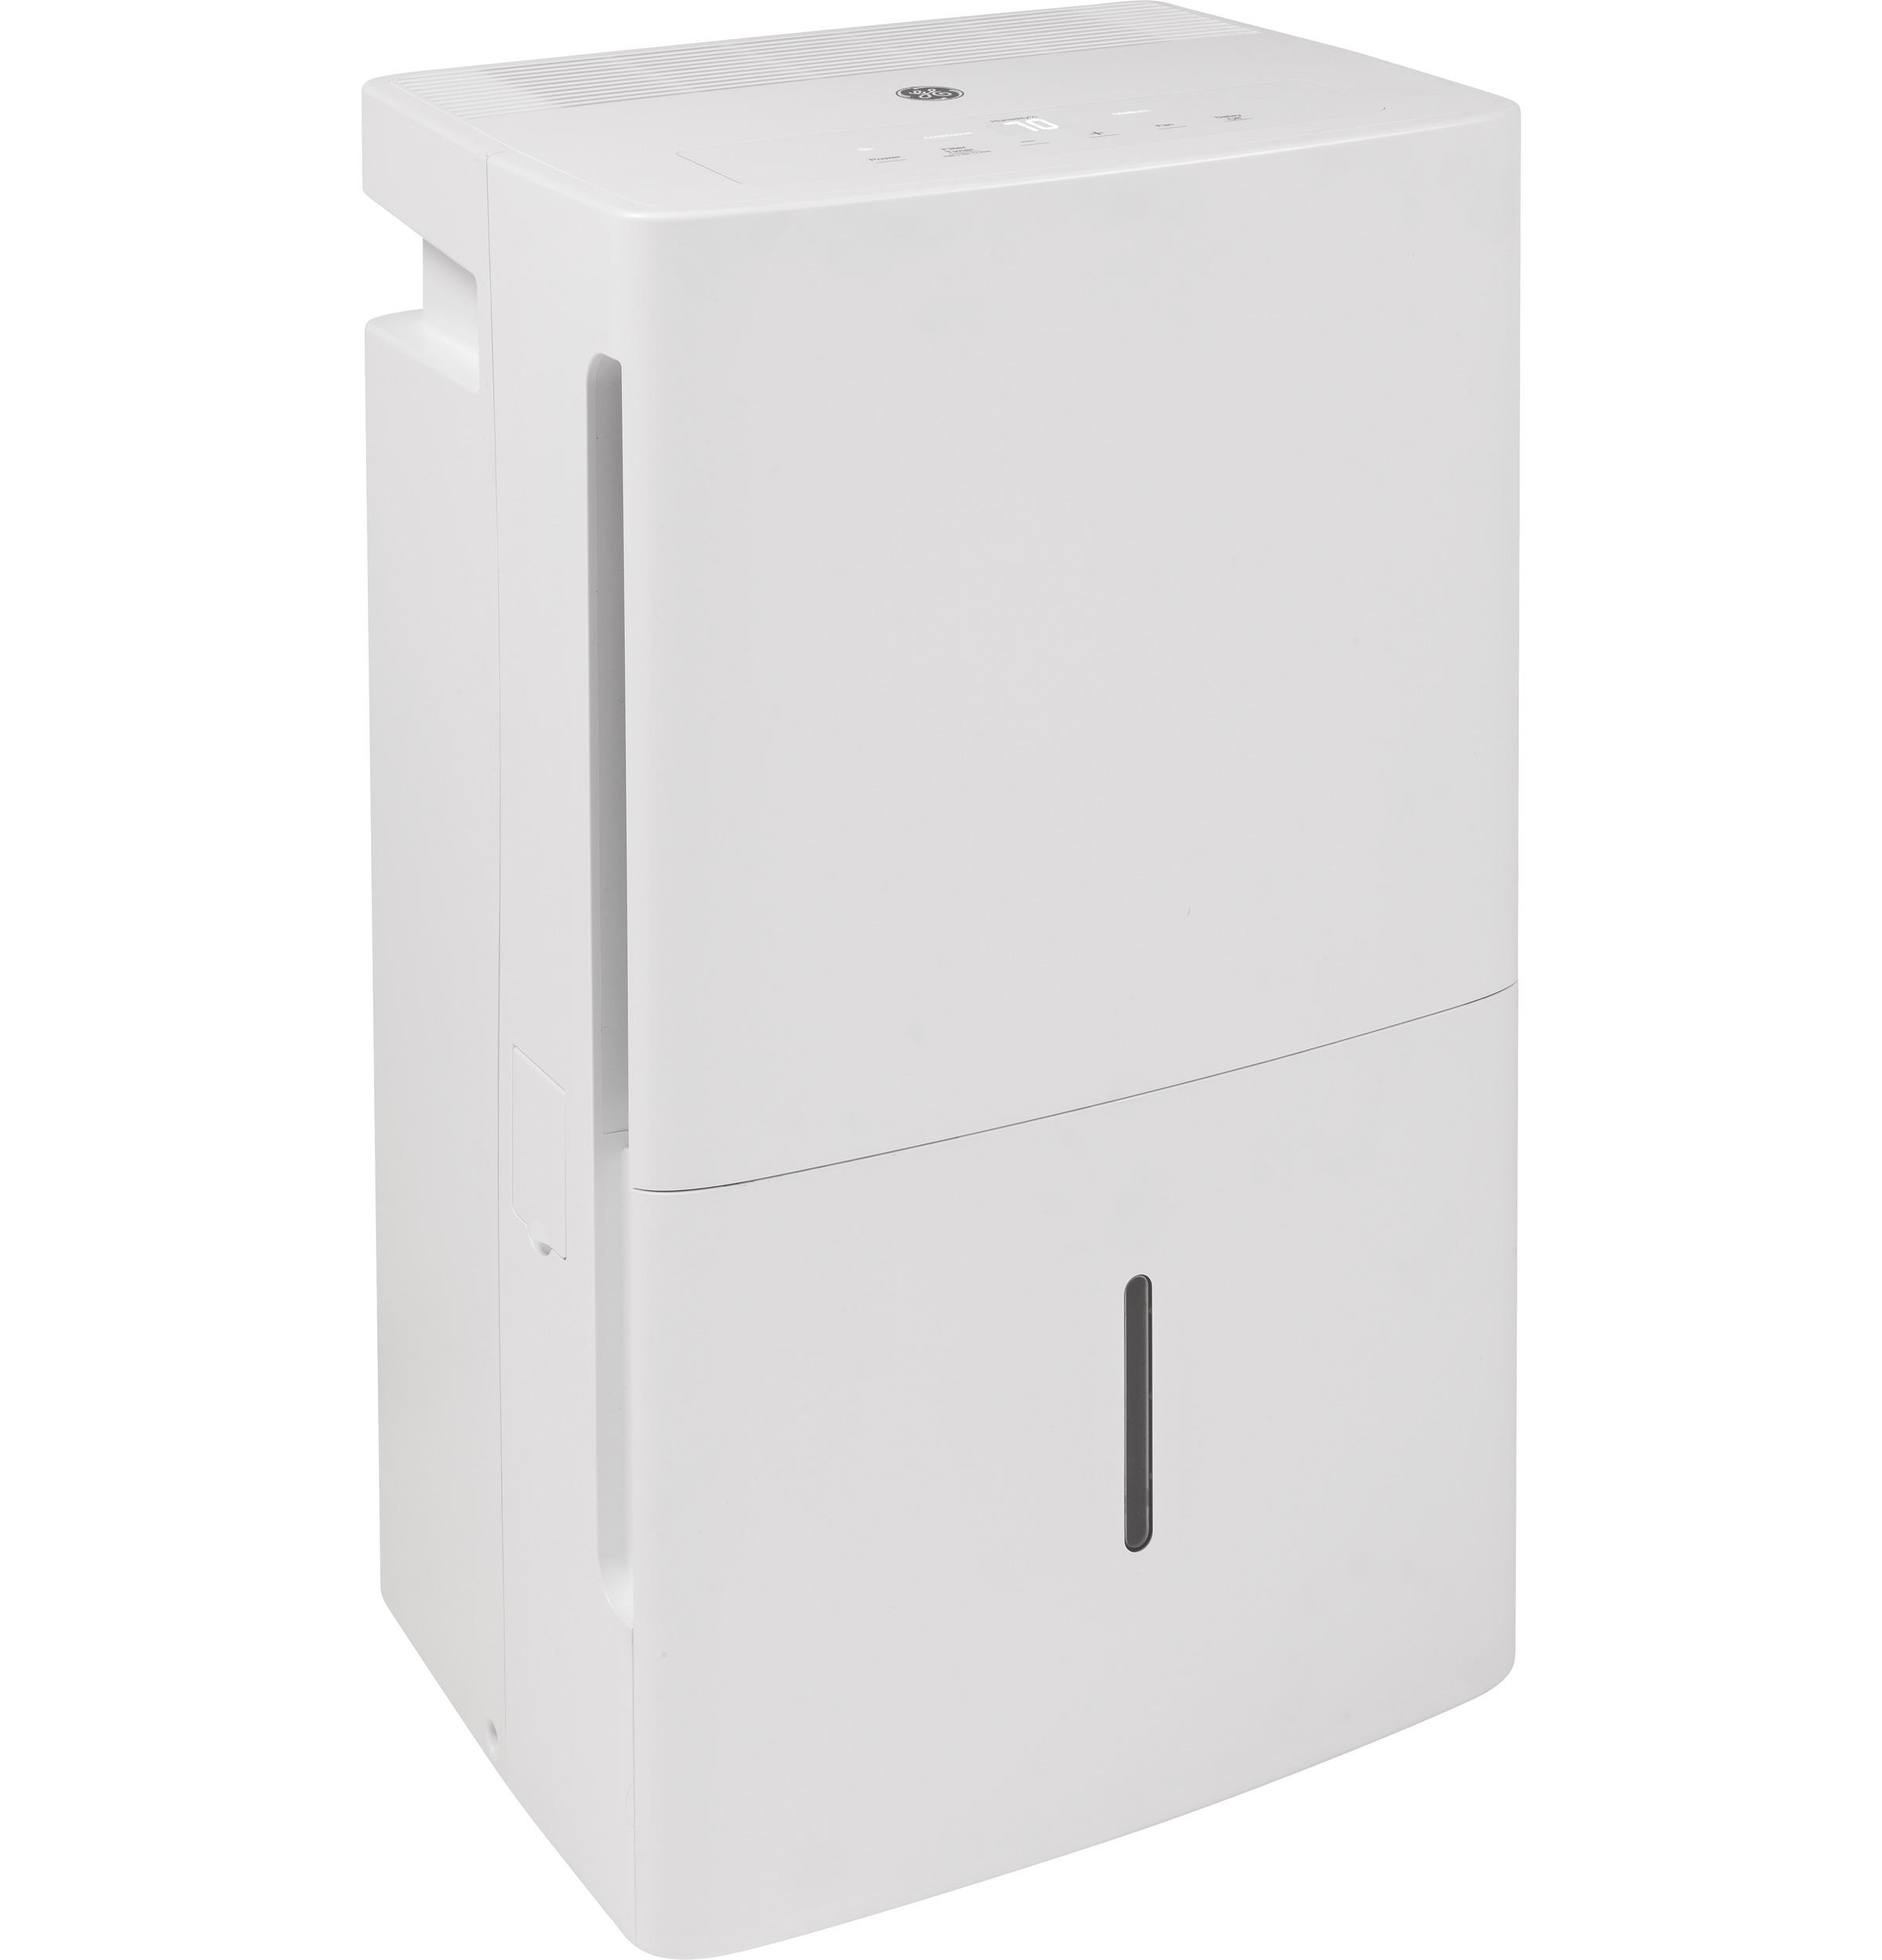 Model: ADEL35LZ | GE GE® Dehumidifier